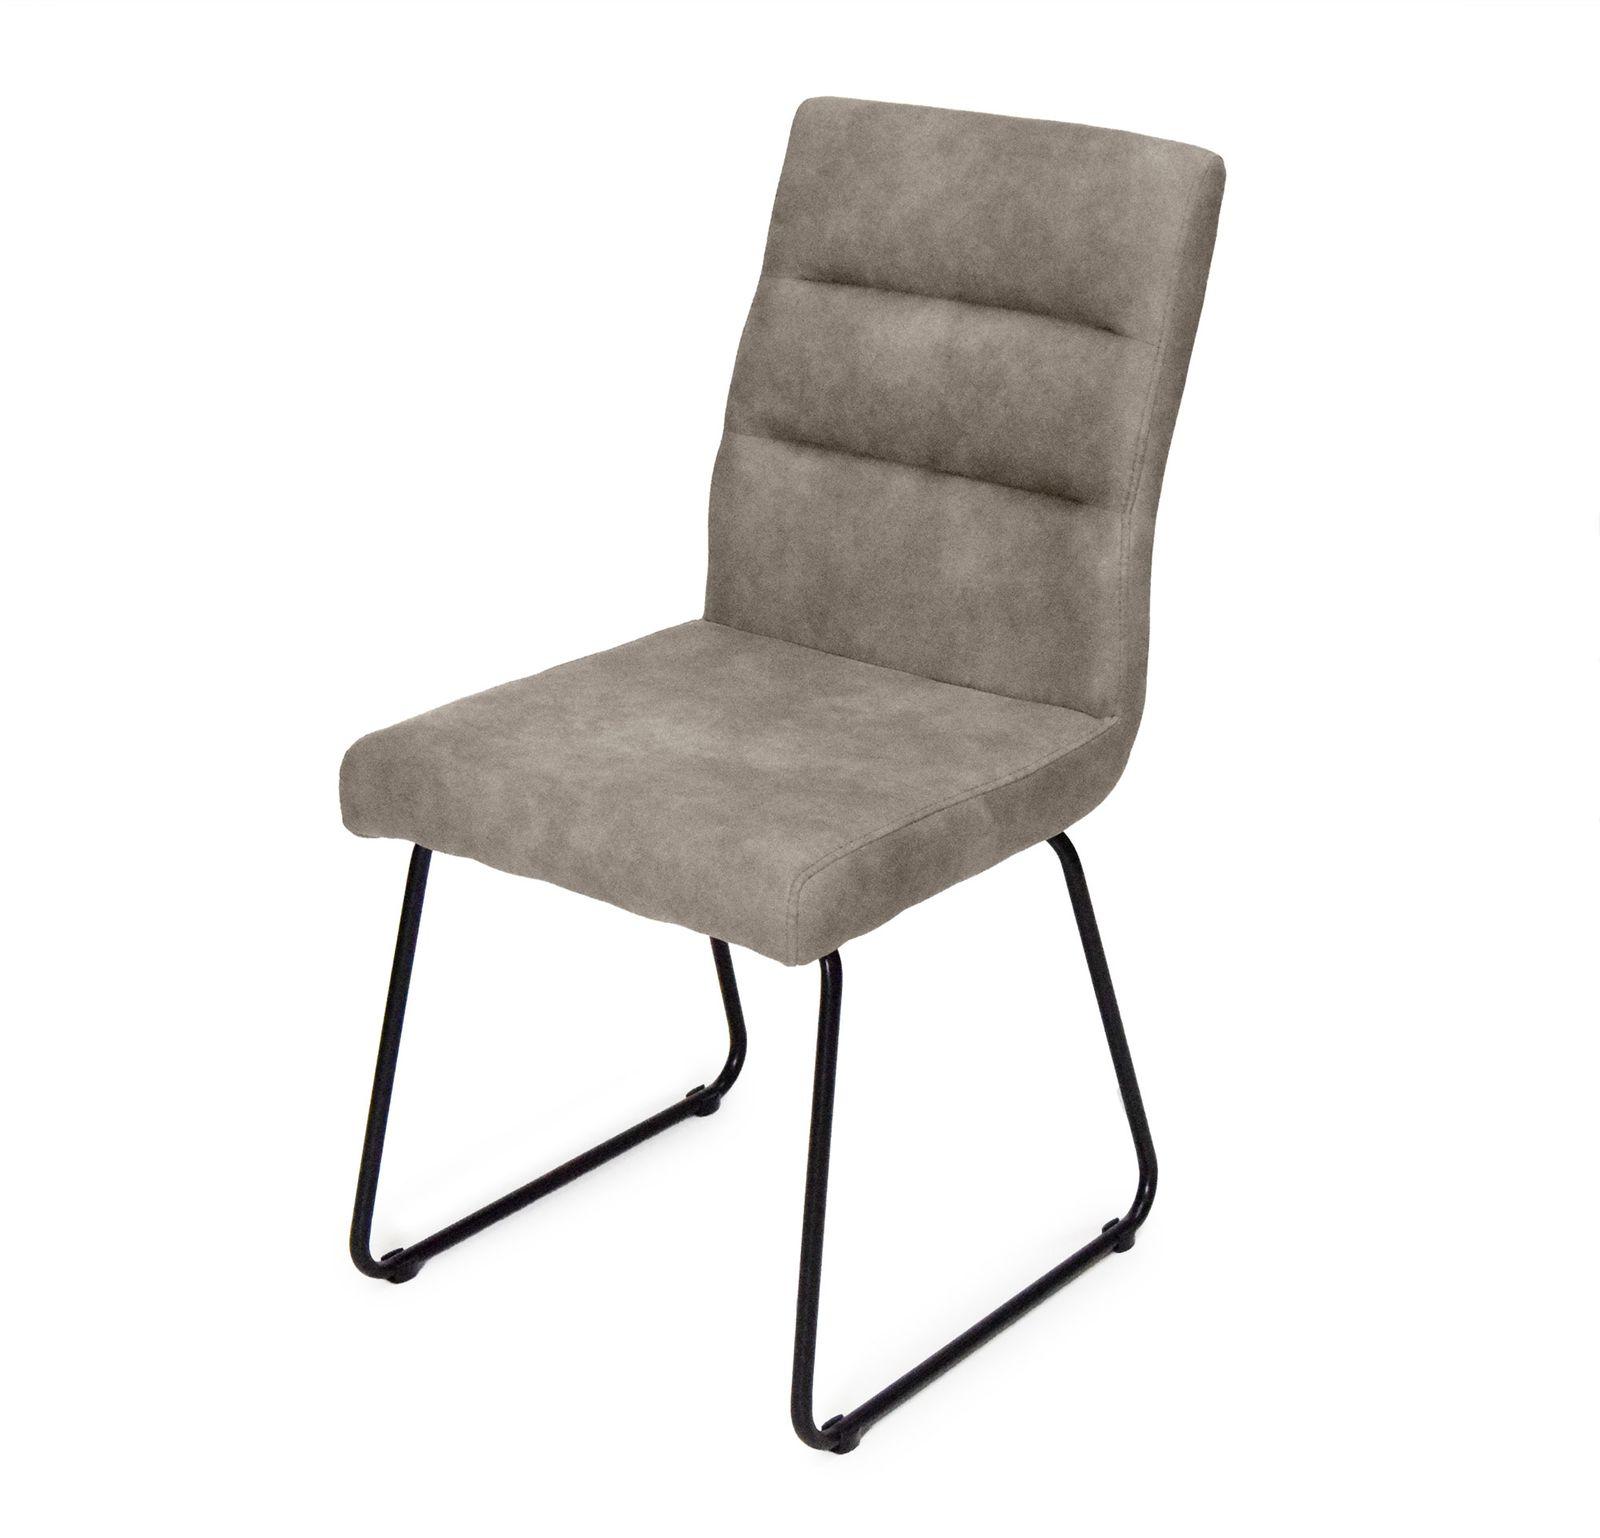 Stuhl Luni in Grau - Beige mit Kufengestell 2er Set